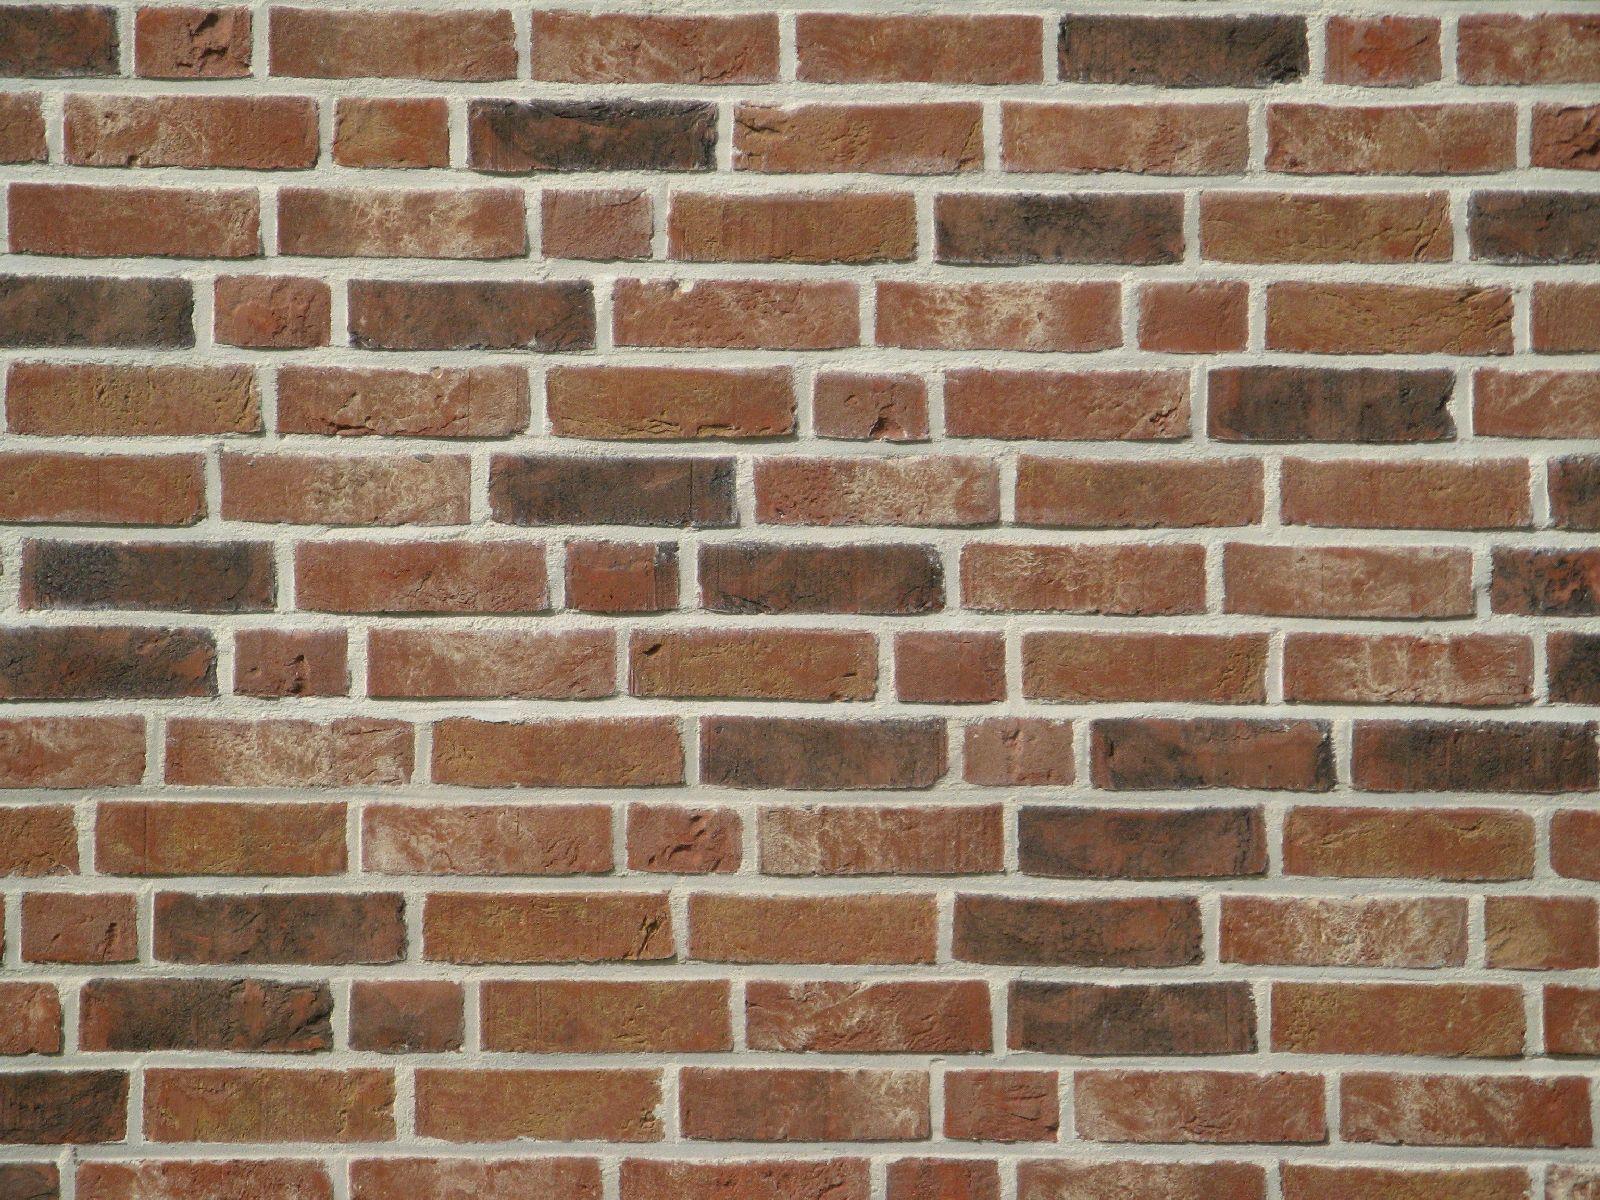 Brick_Texture_B_2974